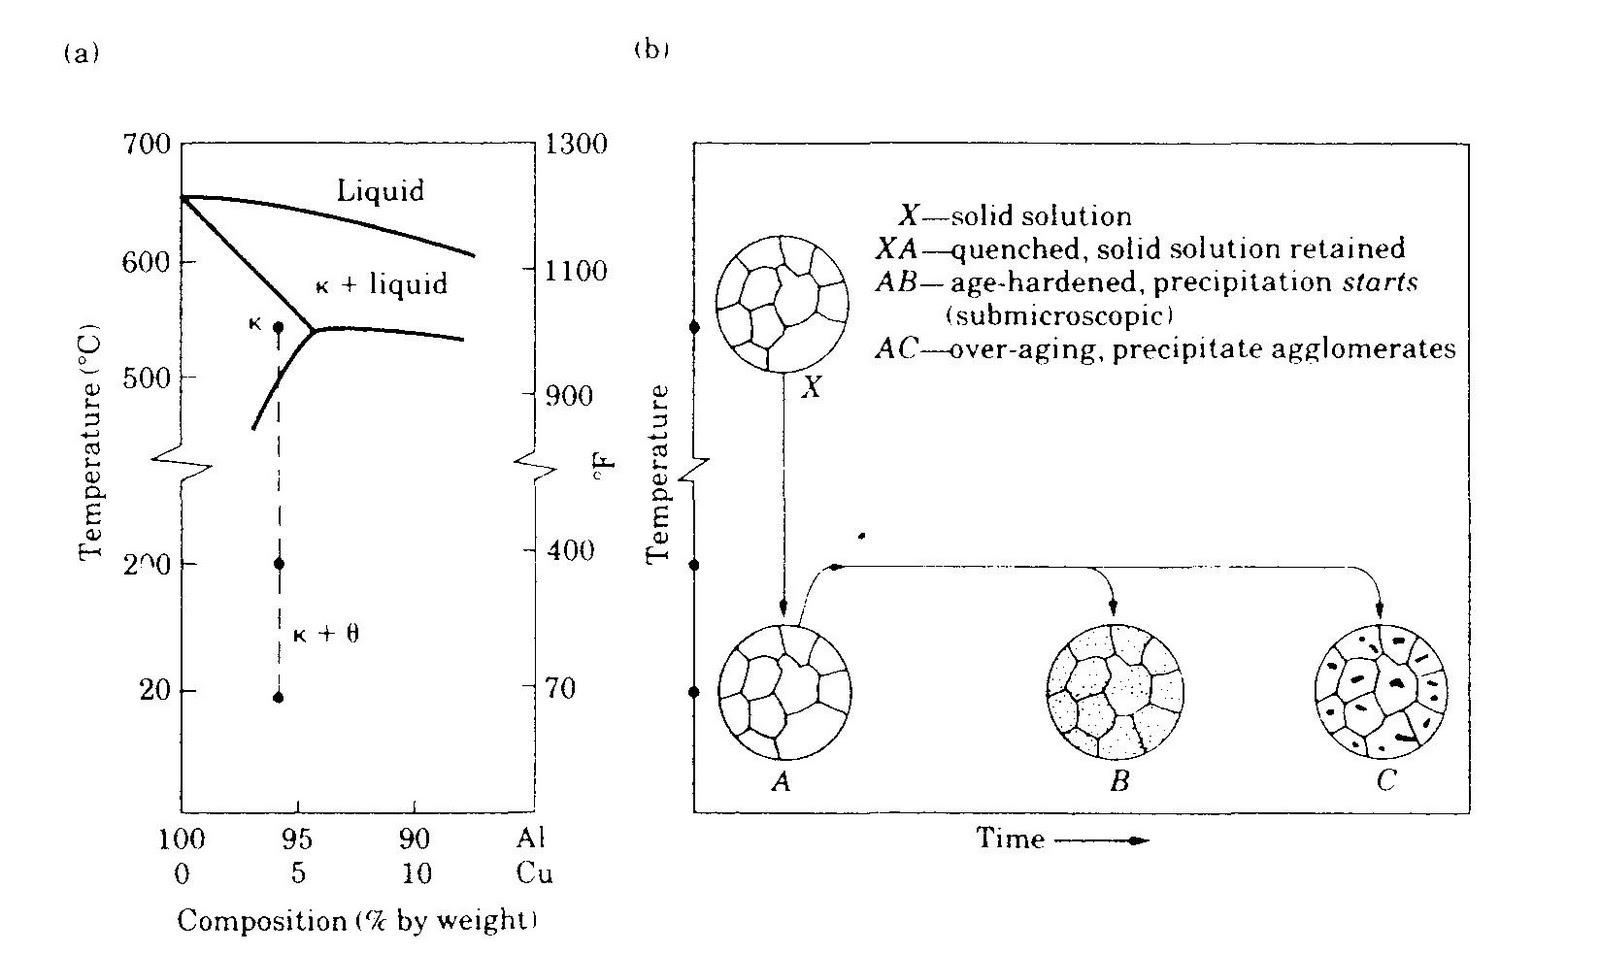 Pemilihan bahan dan proses si situs dan menggabungkan dengan atom aluminium menghasilkan fase theta yang merupakan sebagai presipitat submicroscopic ditampilkan dalam b oleh titik ccuart Image collections